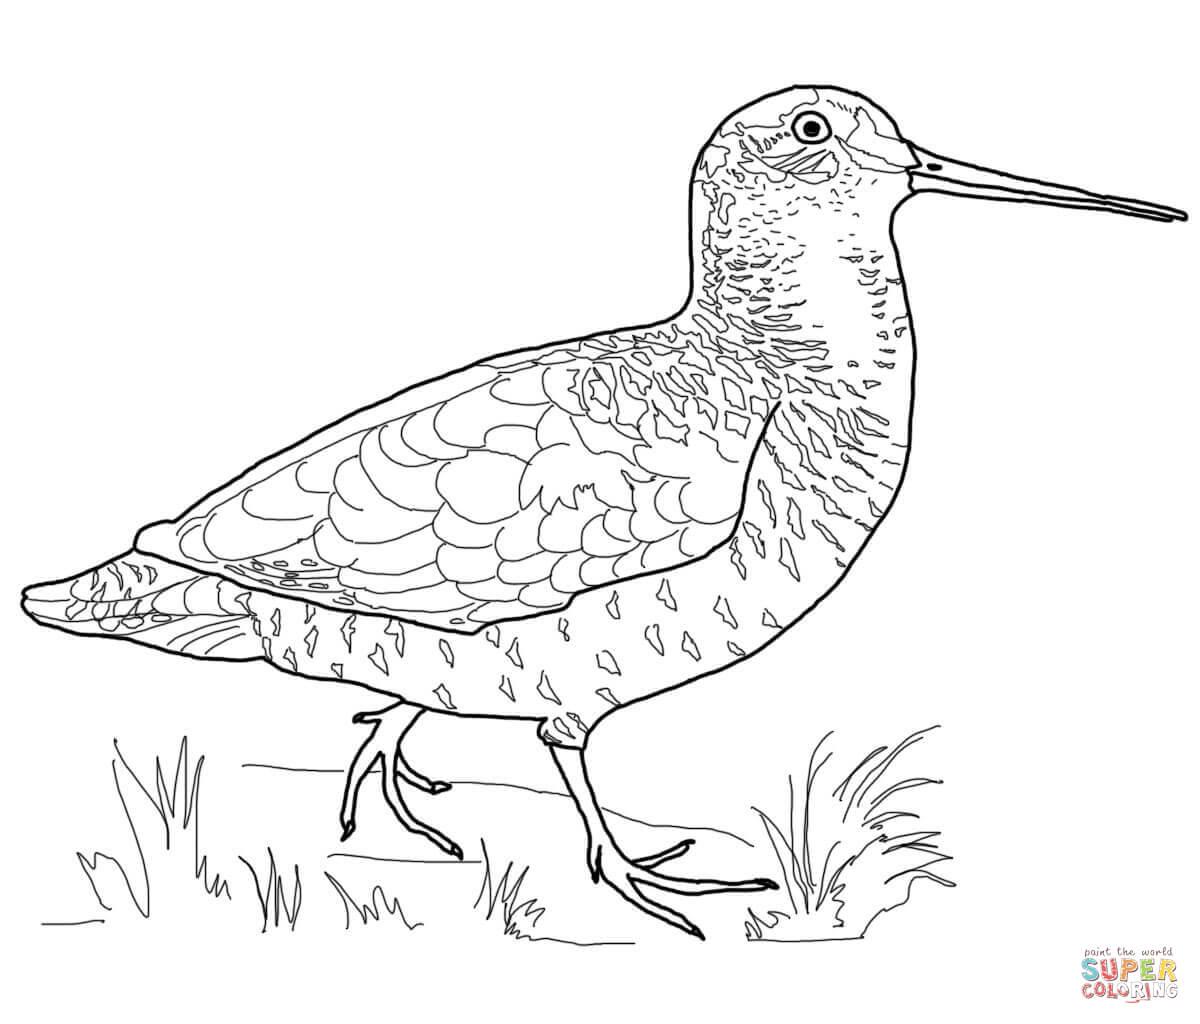 woodcock-bird-coloring-page.jpg 1,200×1,600 pixels